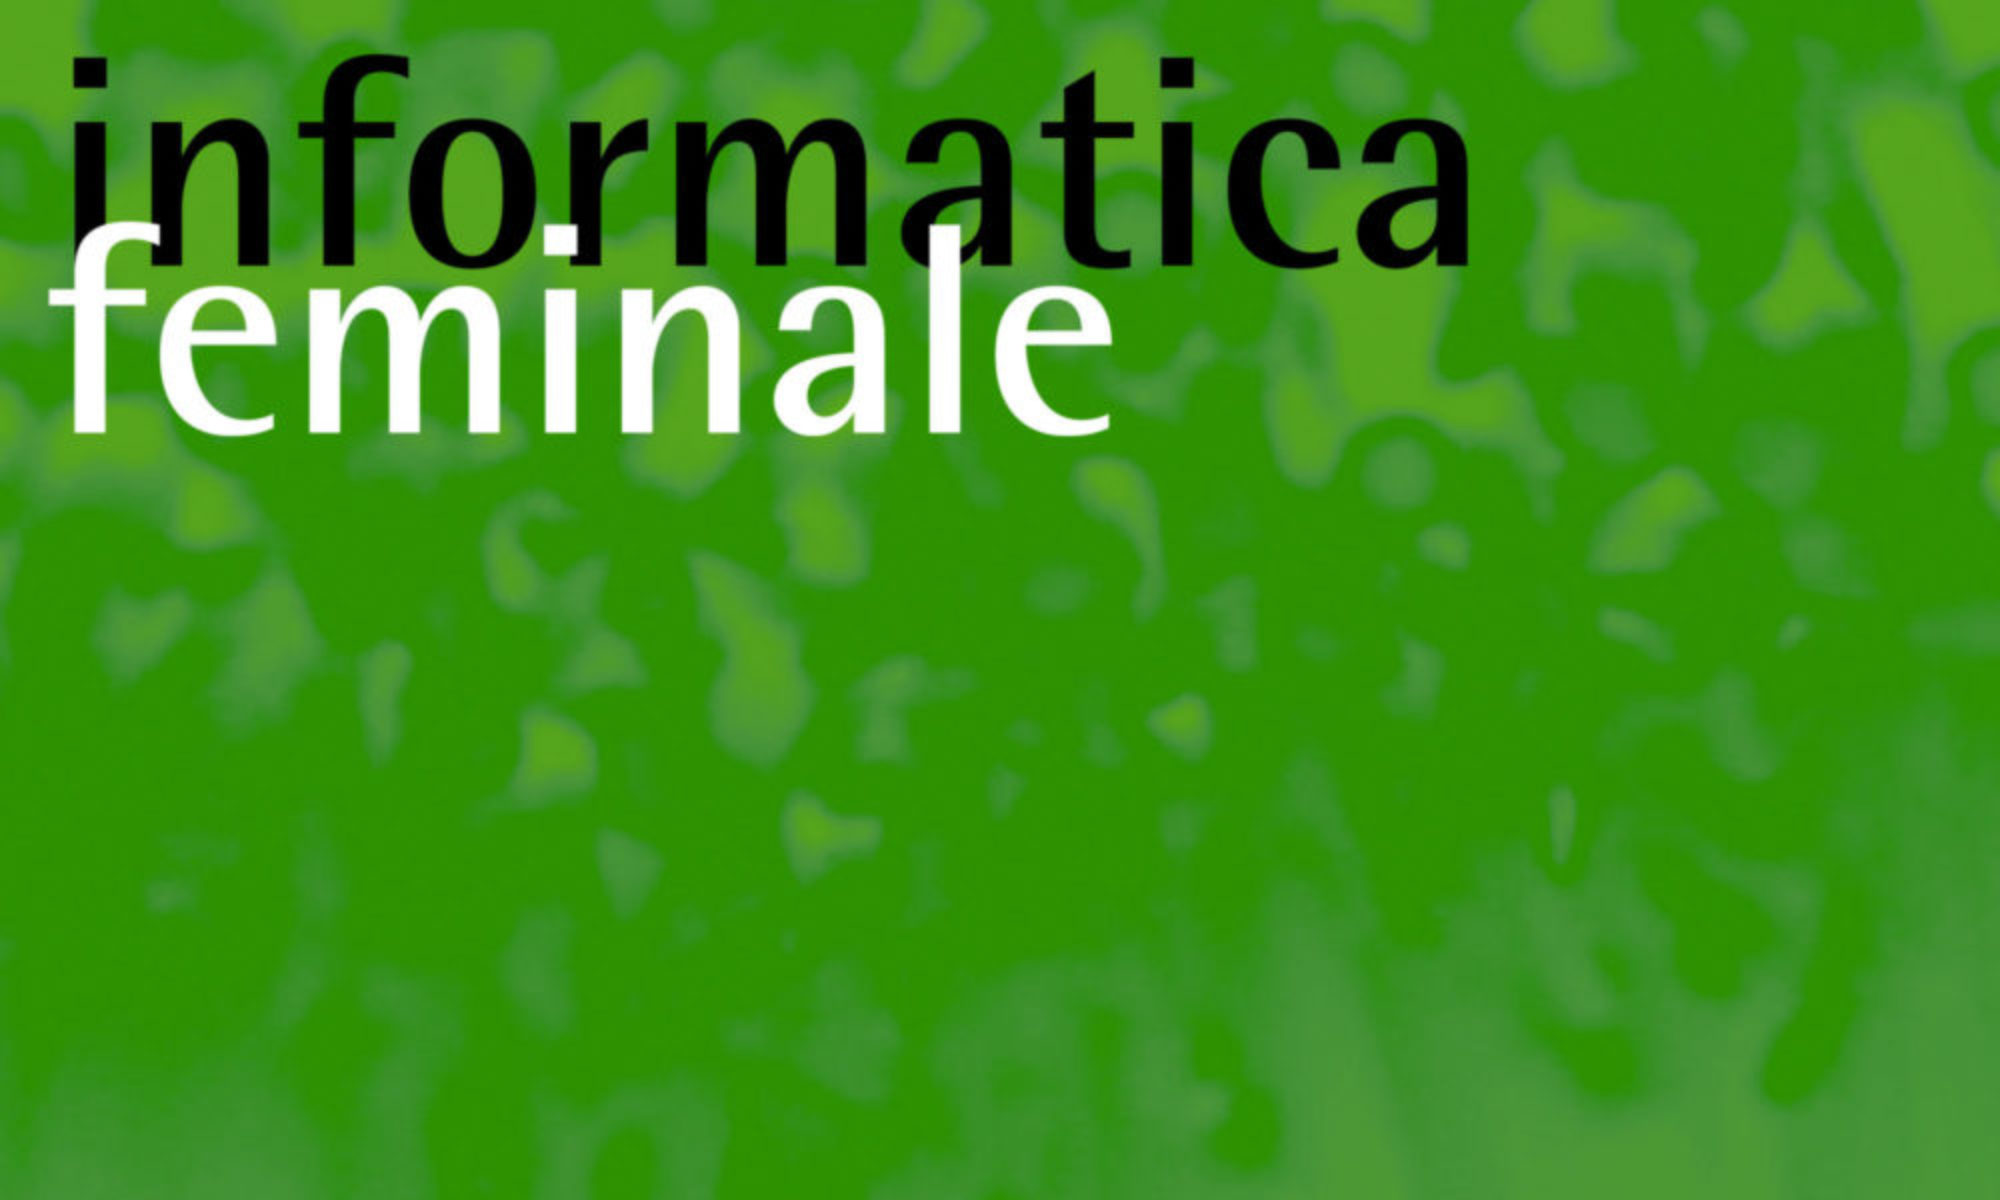 24. Informatica Feminale